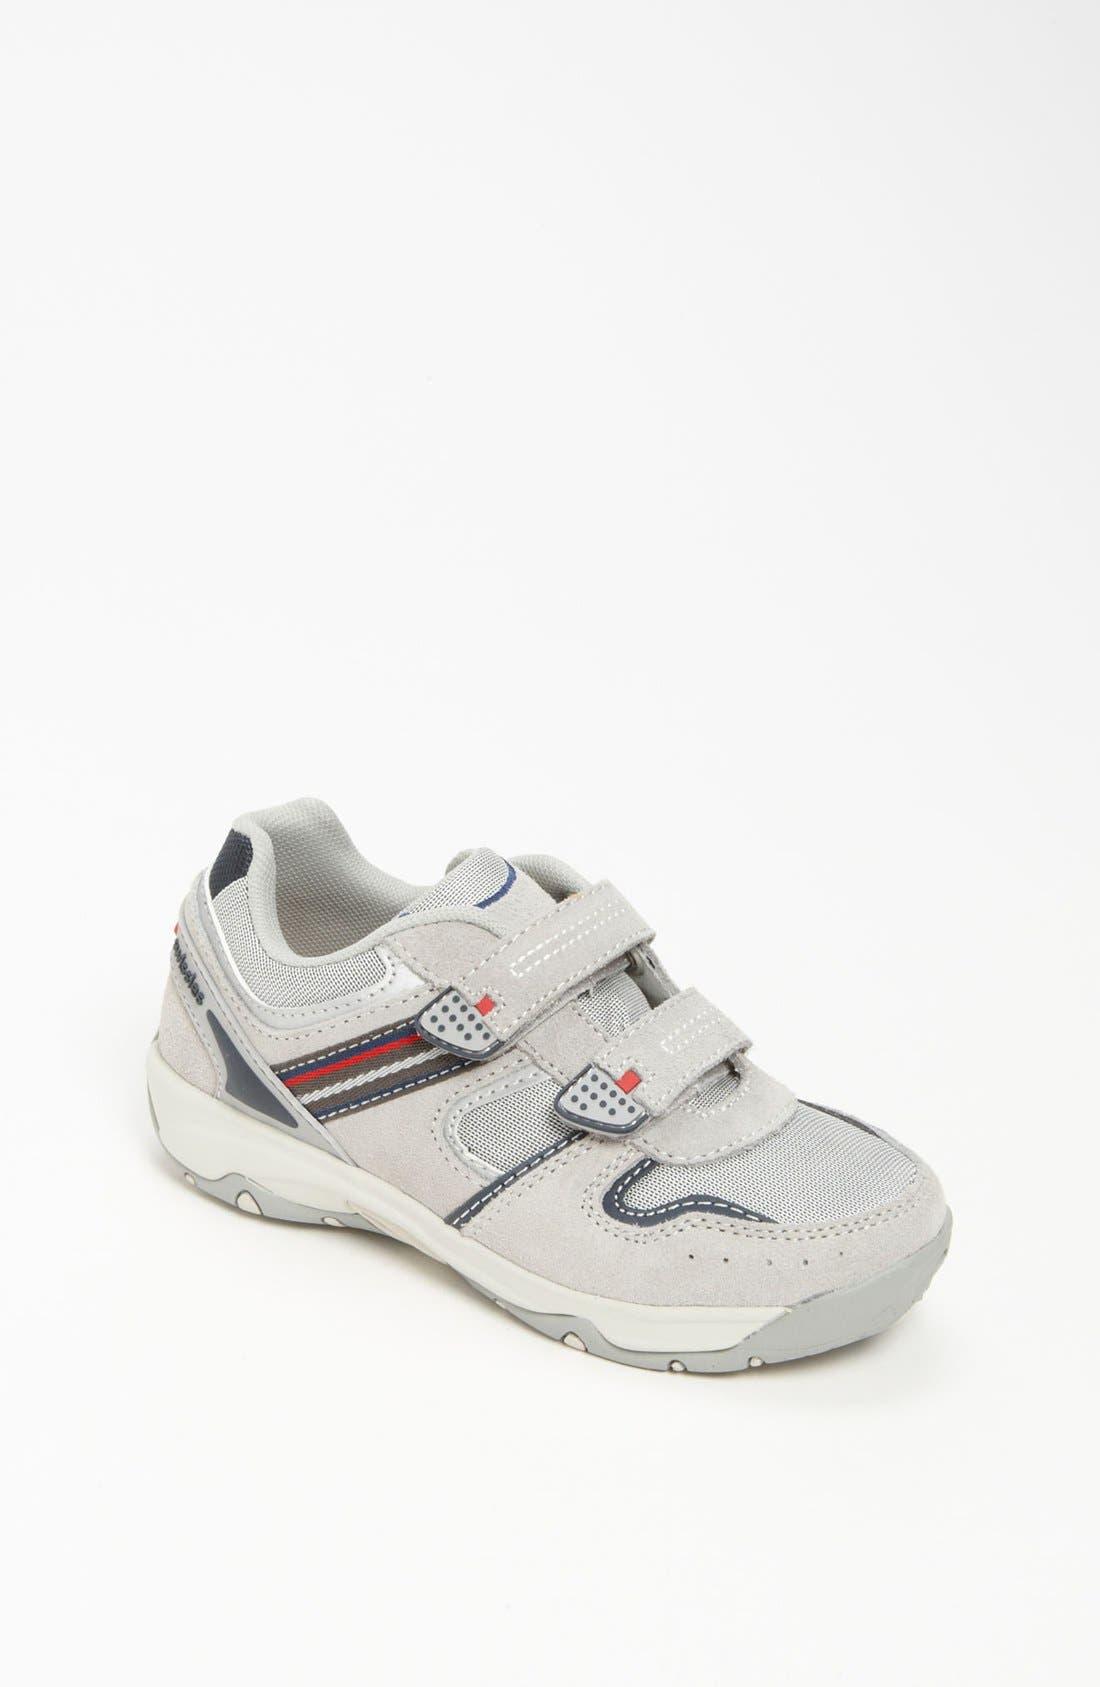 Alternate Image 1 Selected - Swissies 'Terry' Sneaker (Toddler & Little Kid)